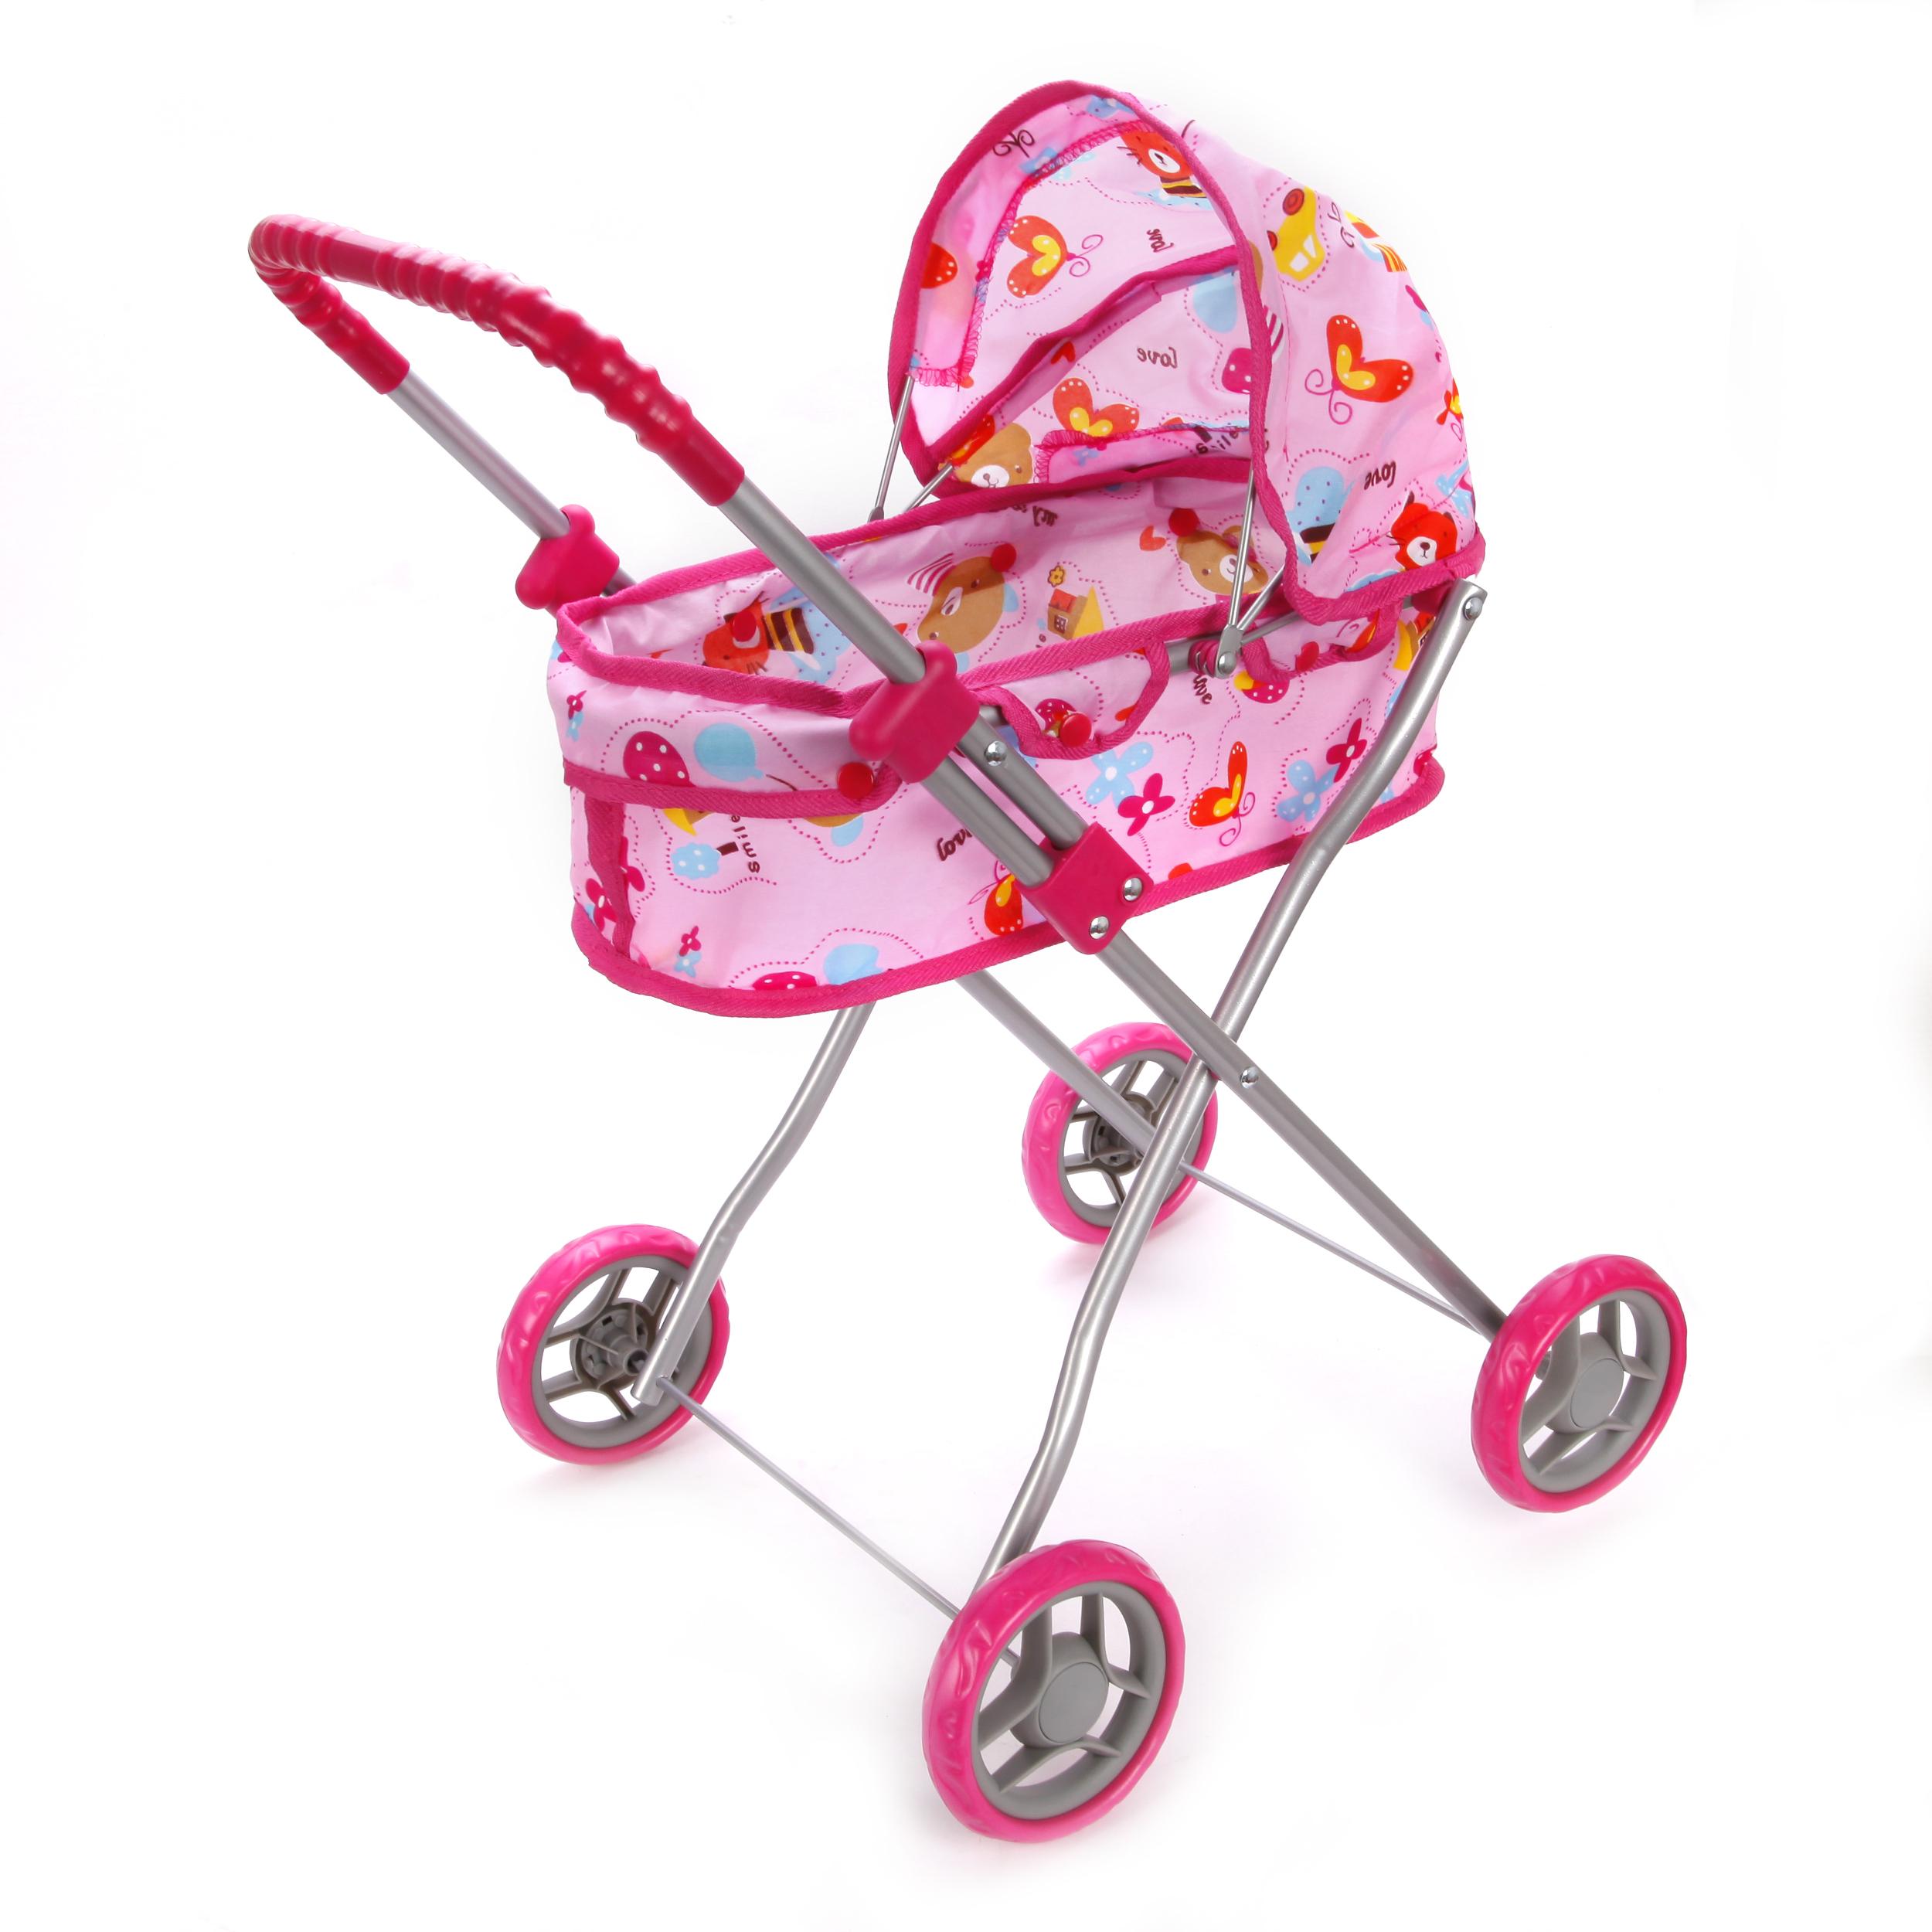 Коляски для кукол Mary Poppins Коляска-люлька для куклы Mary Poppins розовая mary poppins коляска трансформер mary poppins 67230 фиолетовый